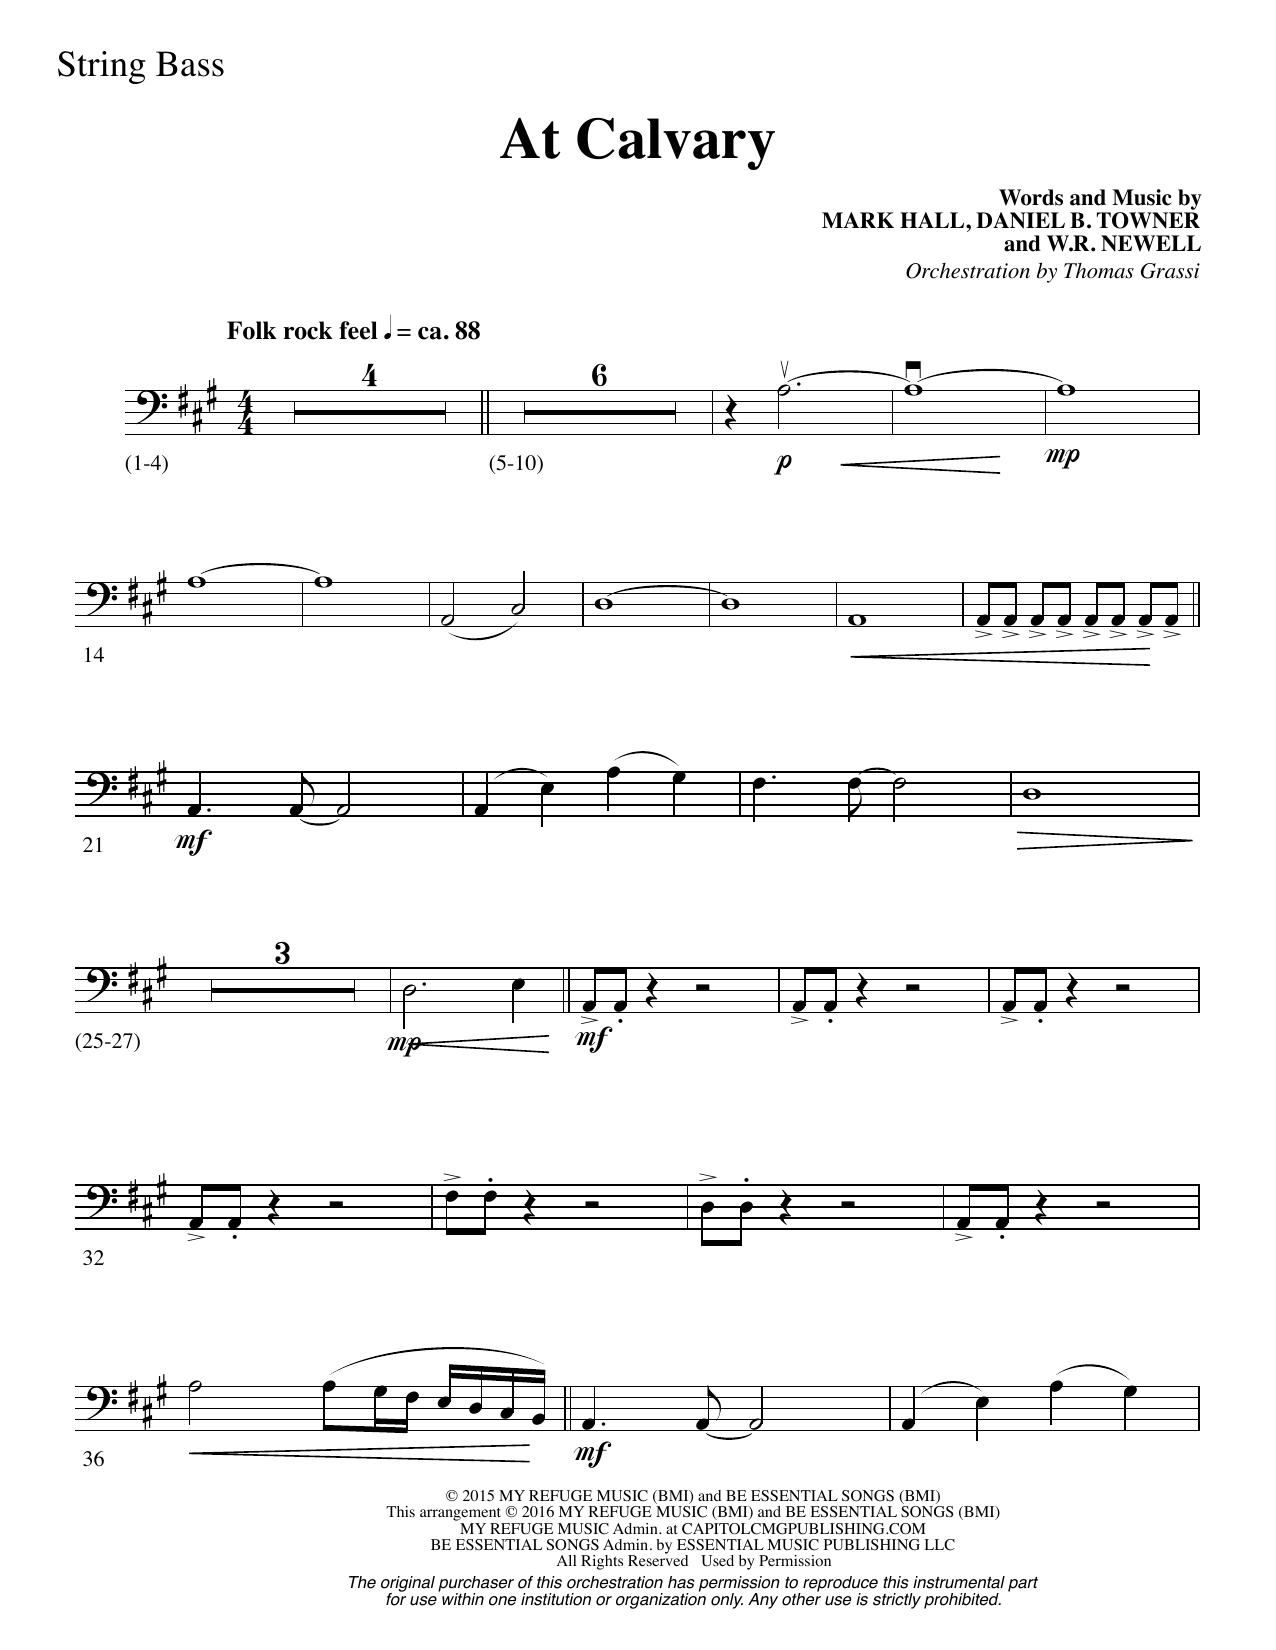 At Calvary - Double Bass Sheet Music